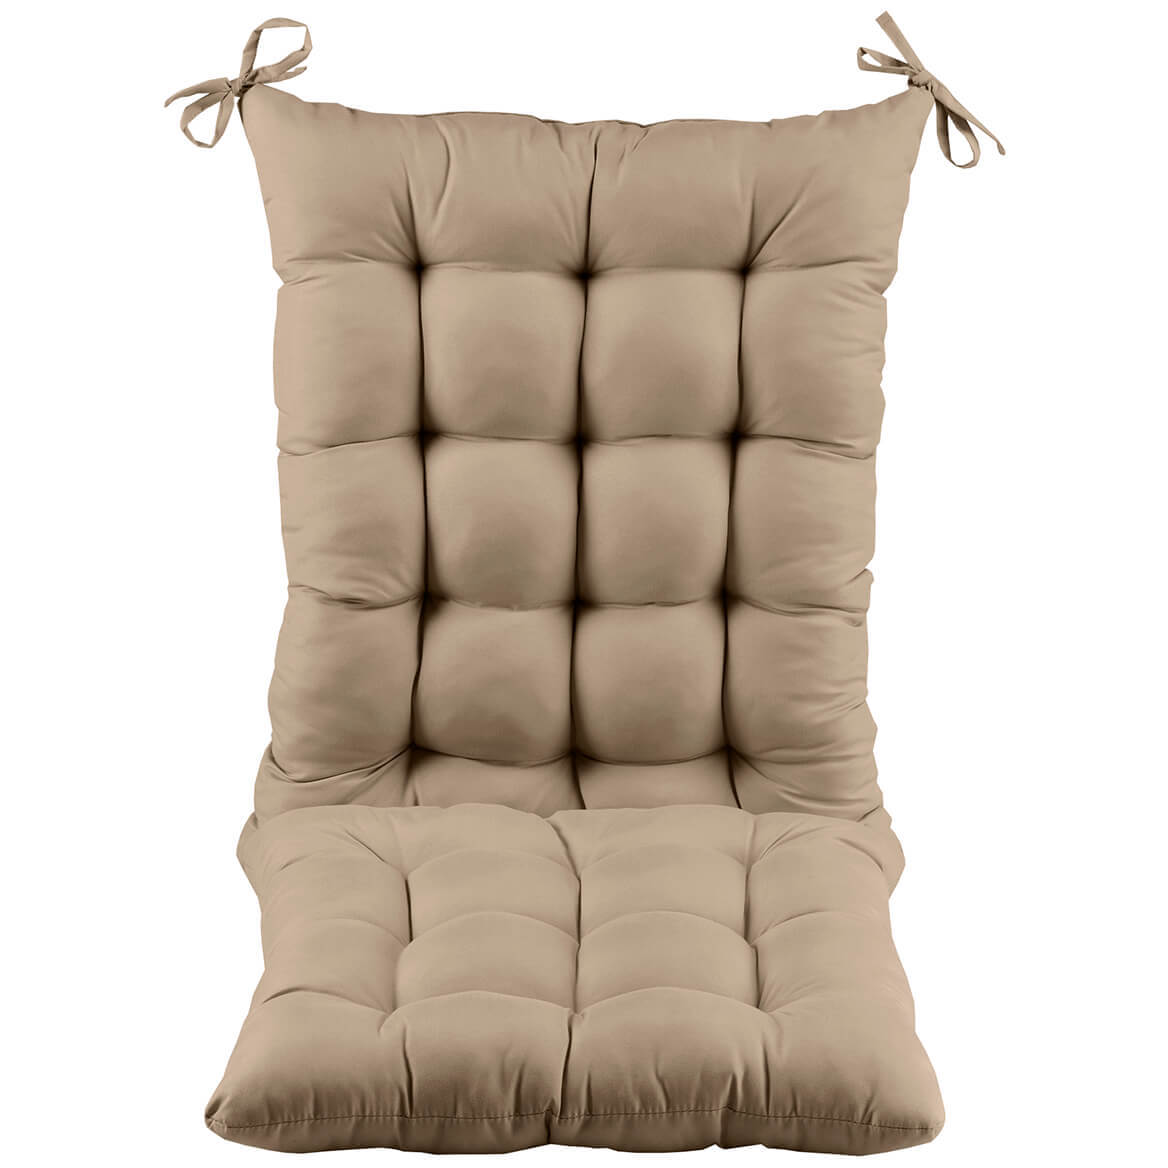 OakRidge Rocking Chair Cushion, Beige, 2-piece Set